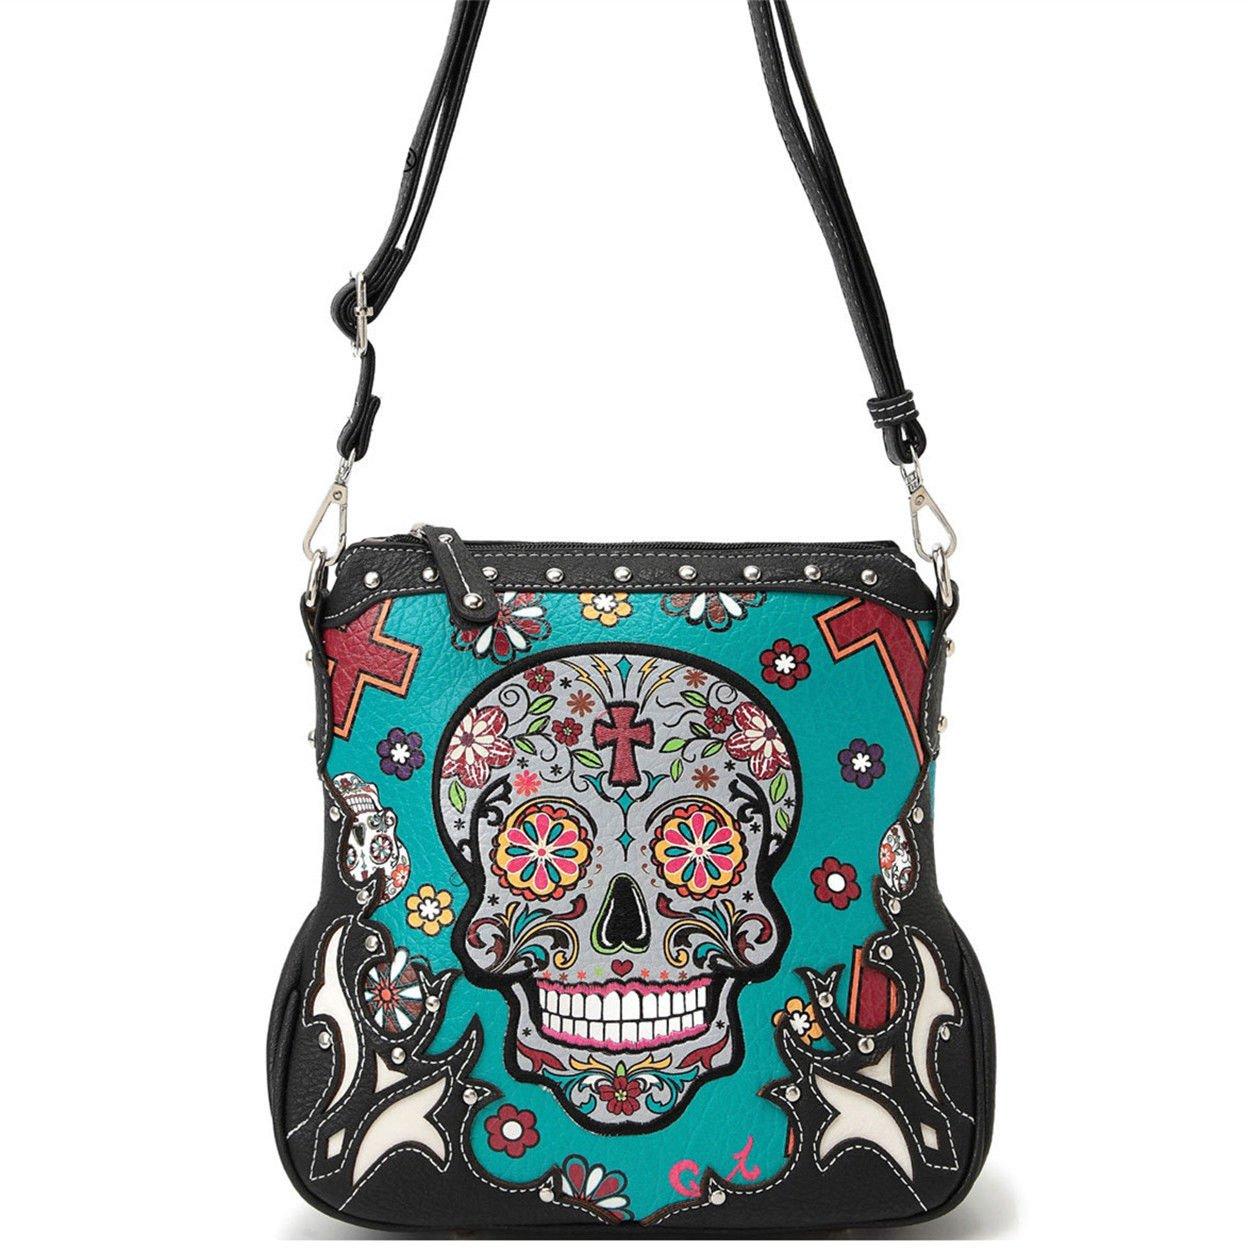 Western Sugar Skull Mini Handbag Girl Crossbody Purse Fashion Single Shoulder Bag Phone Purses (Turquoise) by WESTERN ORIGIN (Image #1)